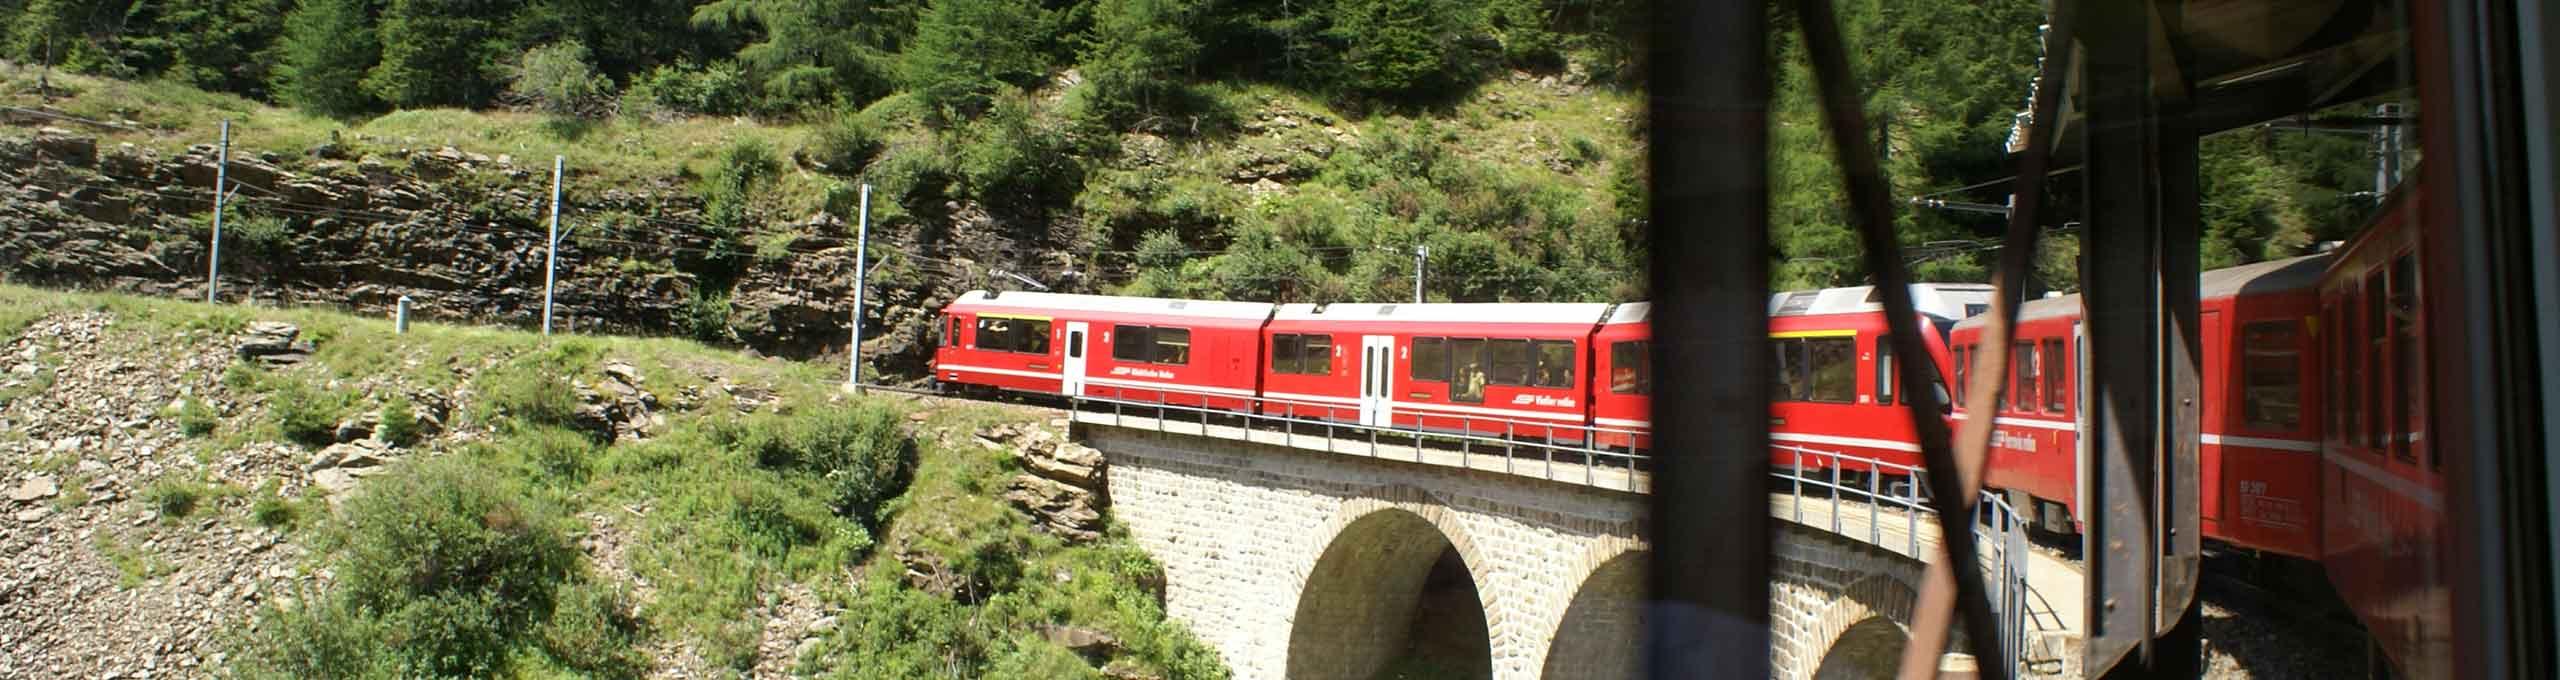 Tirano, Valtellina, trenino rosso